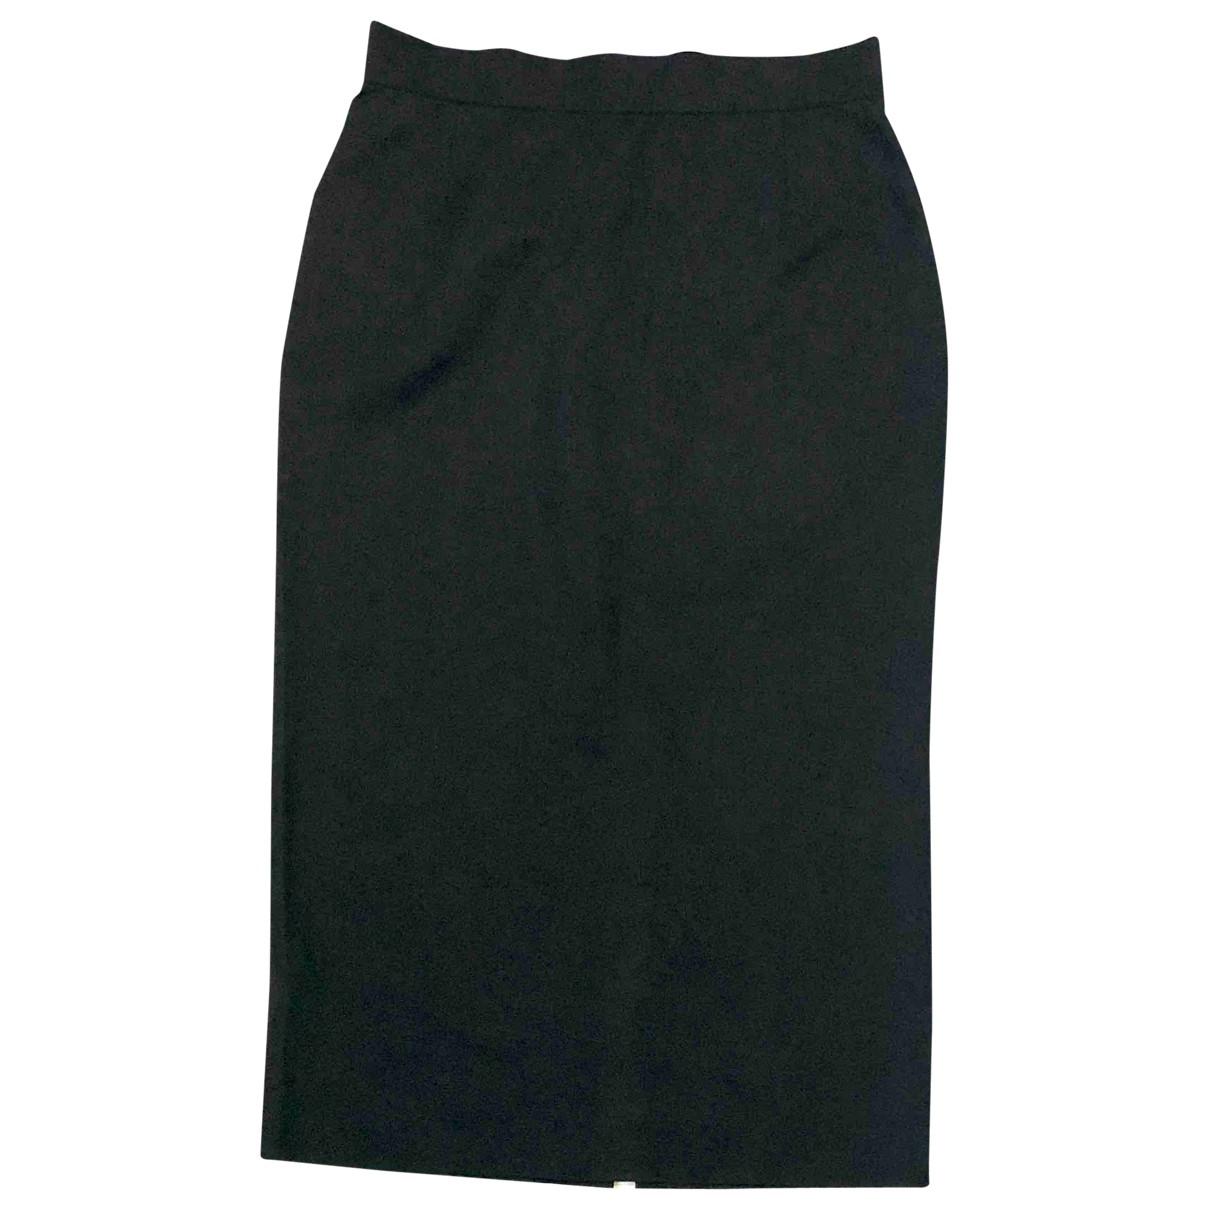 Miu Miu \N Black skirt for Women 38 IT